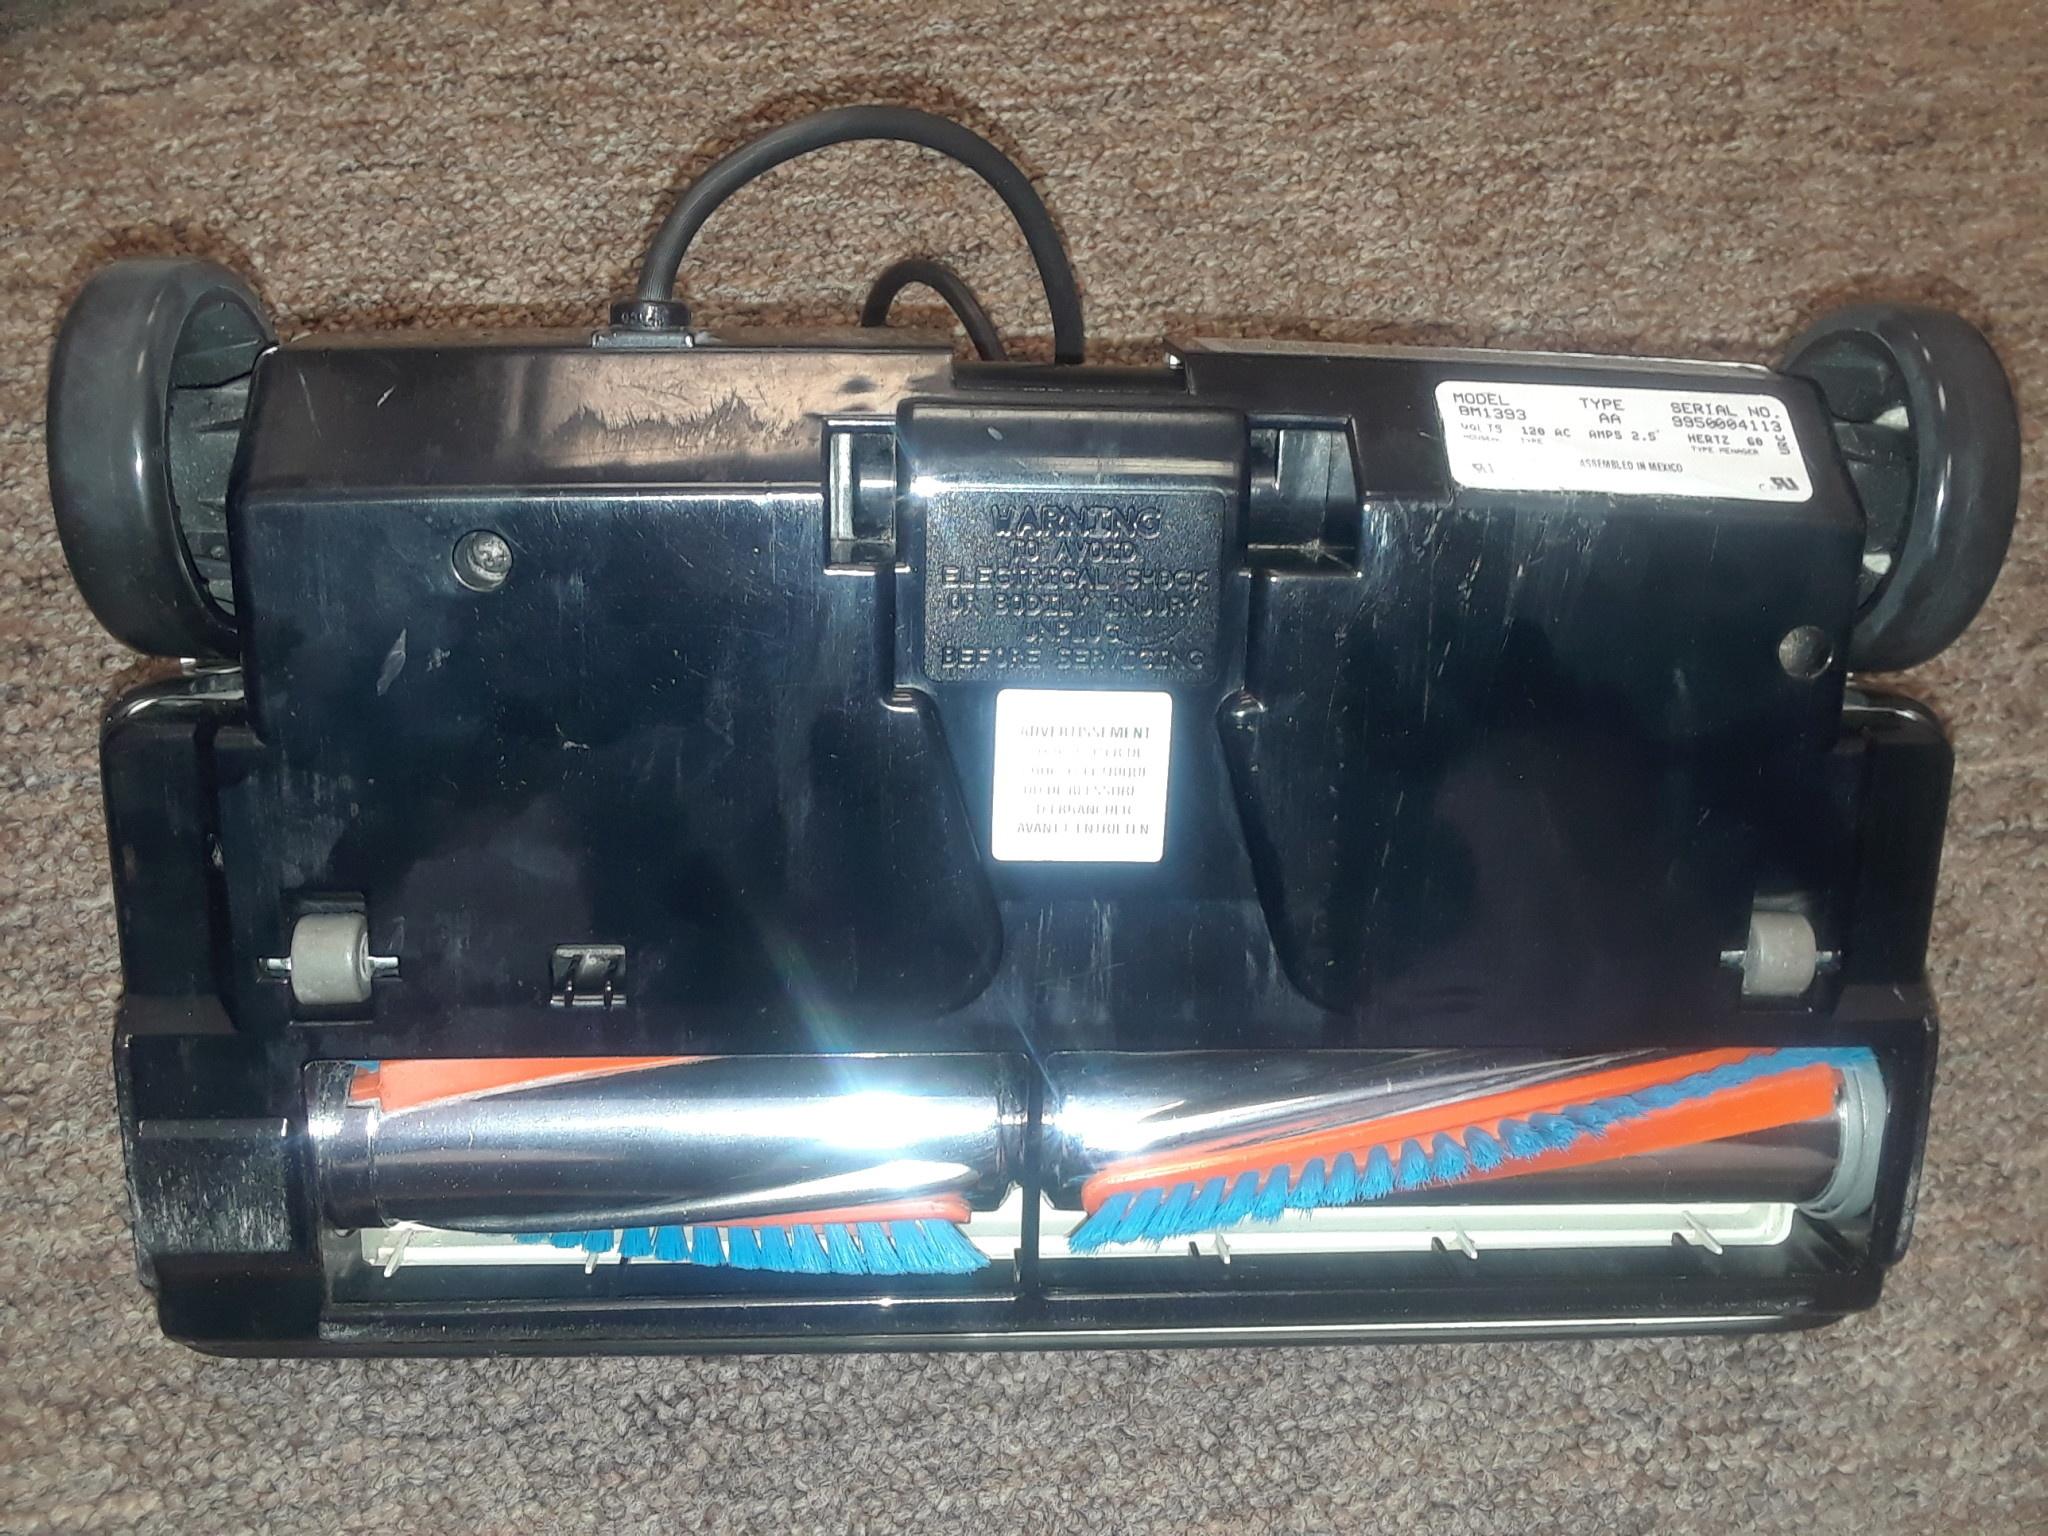 BEAM Refurbished Beam Rugmaster Plus - 9950004113